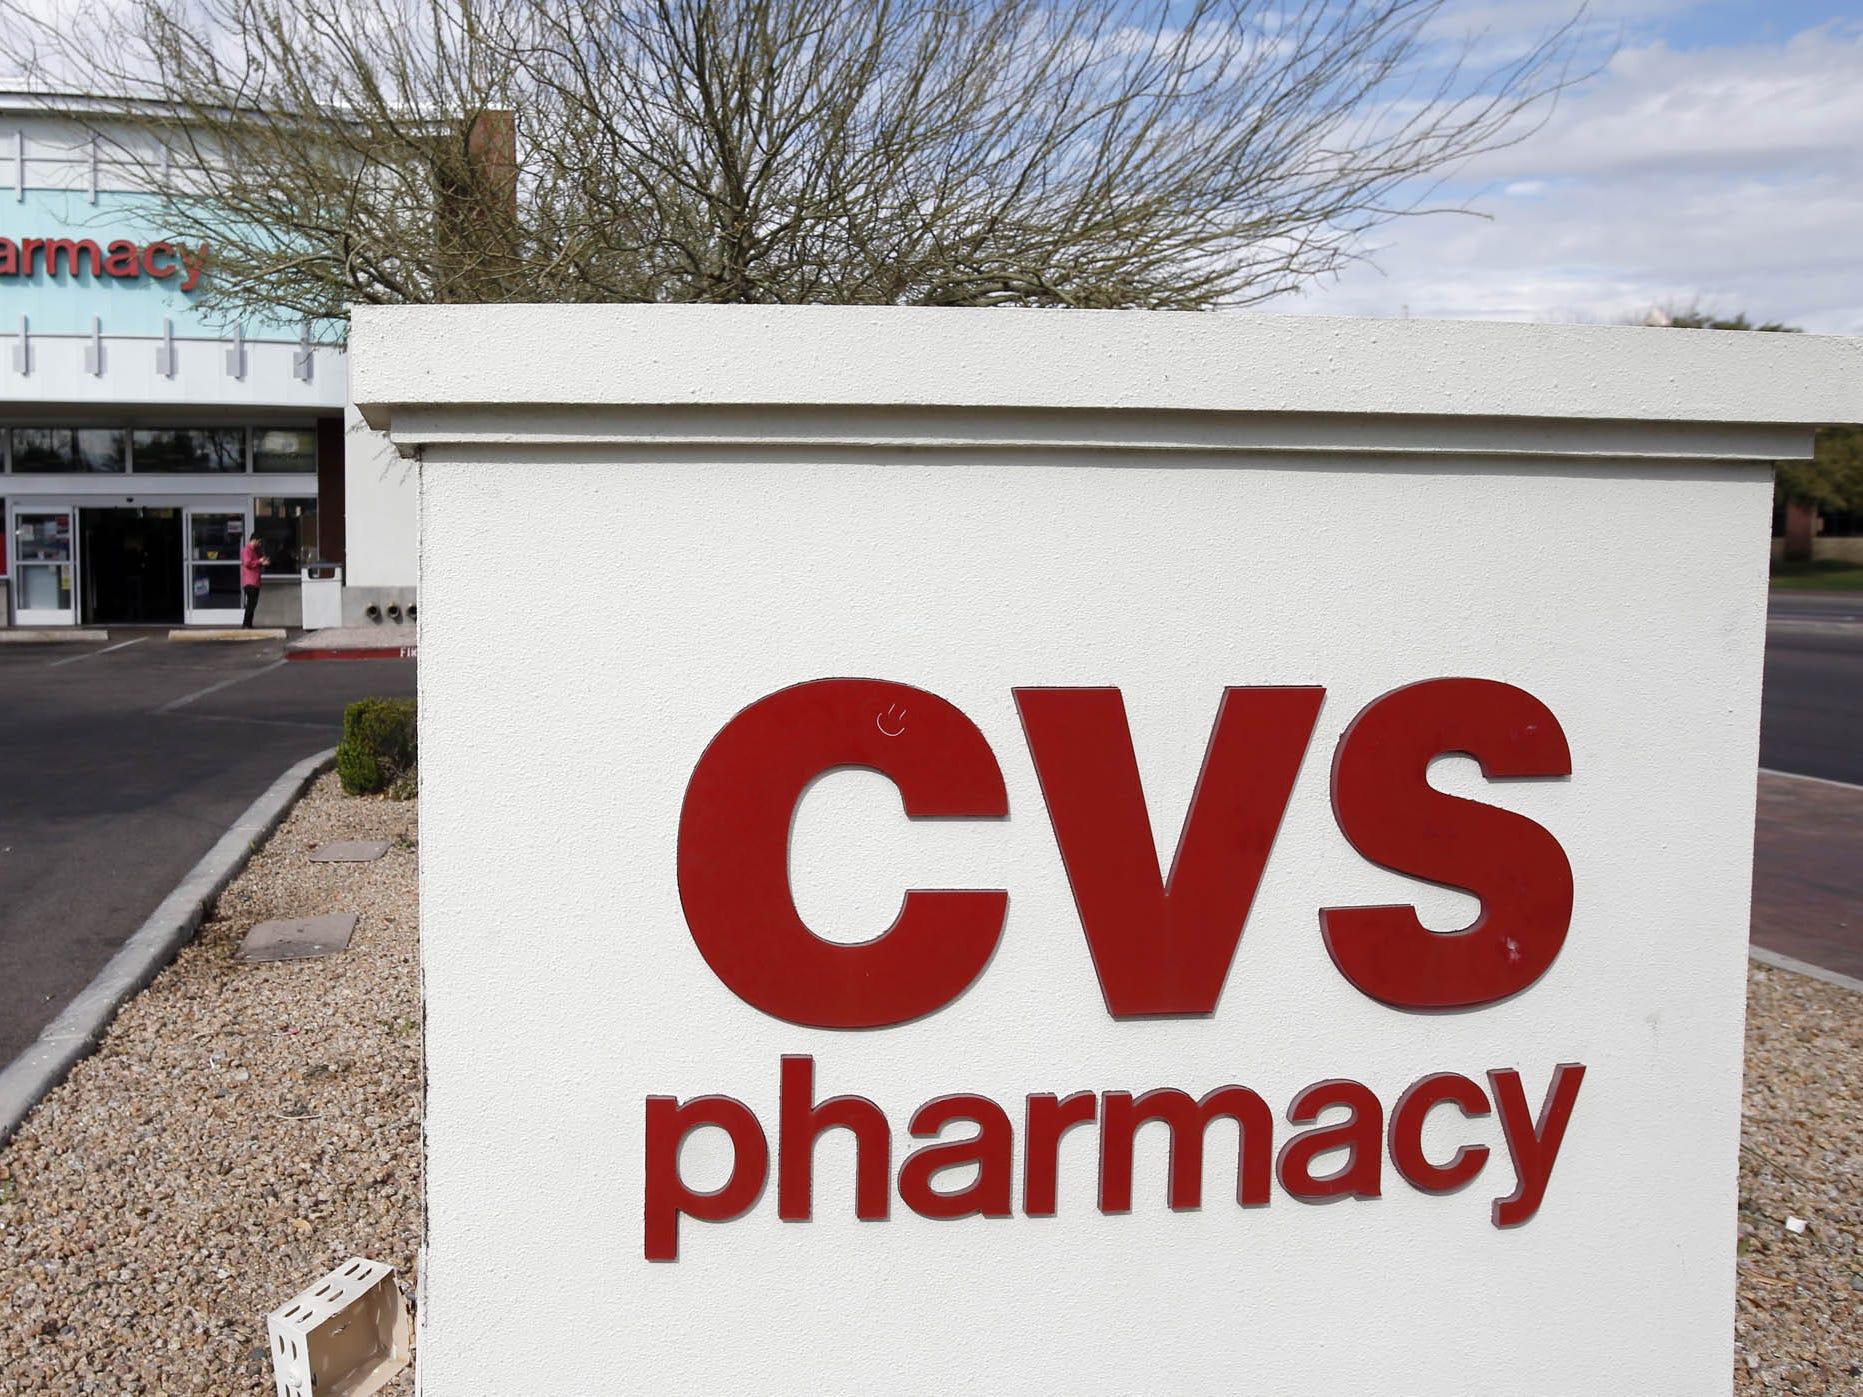 CVS Health, hiring 1,100. The company operates pharmacies and retail centers across the country. Locations in metro Phoenix, Tucson, Prescott, Lake Havasu City and Yuma have openings. More info: jobs.cvshealth.com.